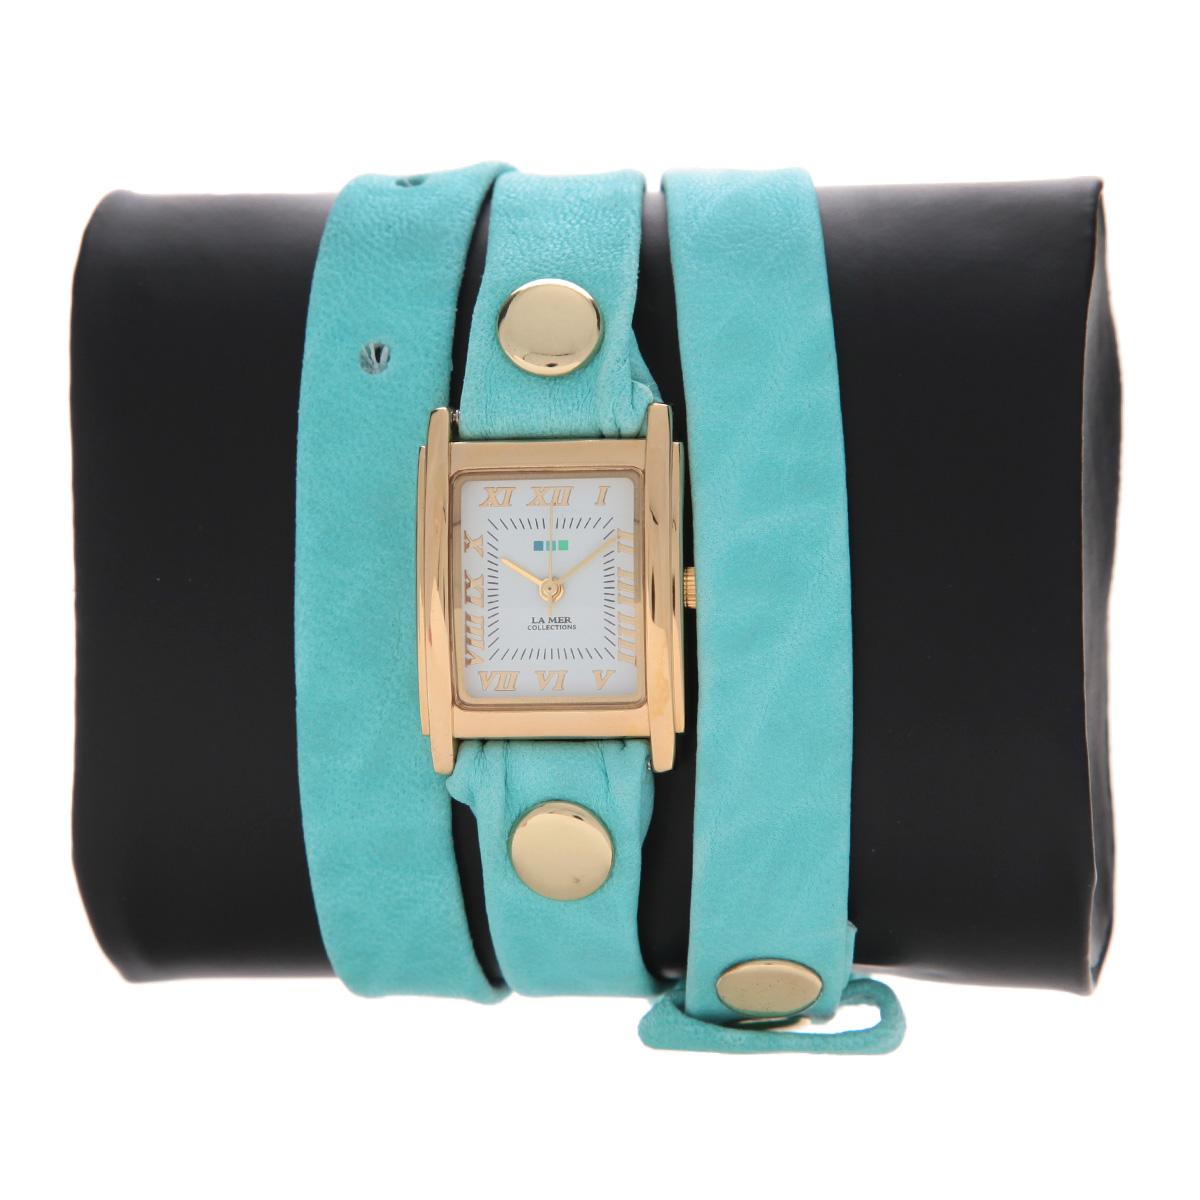 "Часы наручные женские La Mer Collections ""Simple Opal Blue"". LMSTW3002x ( LMSTW3002x )"